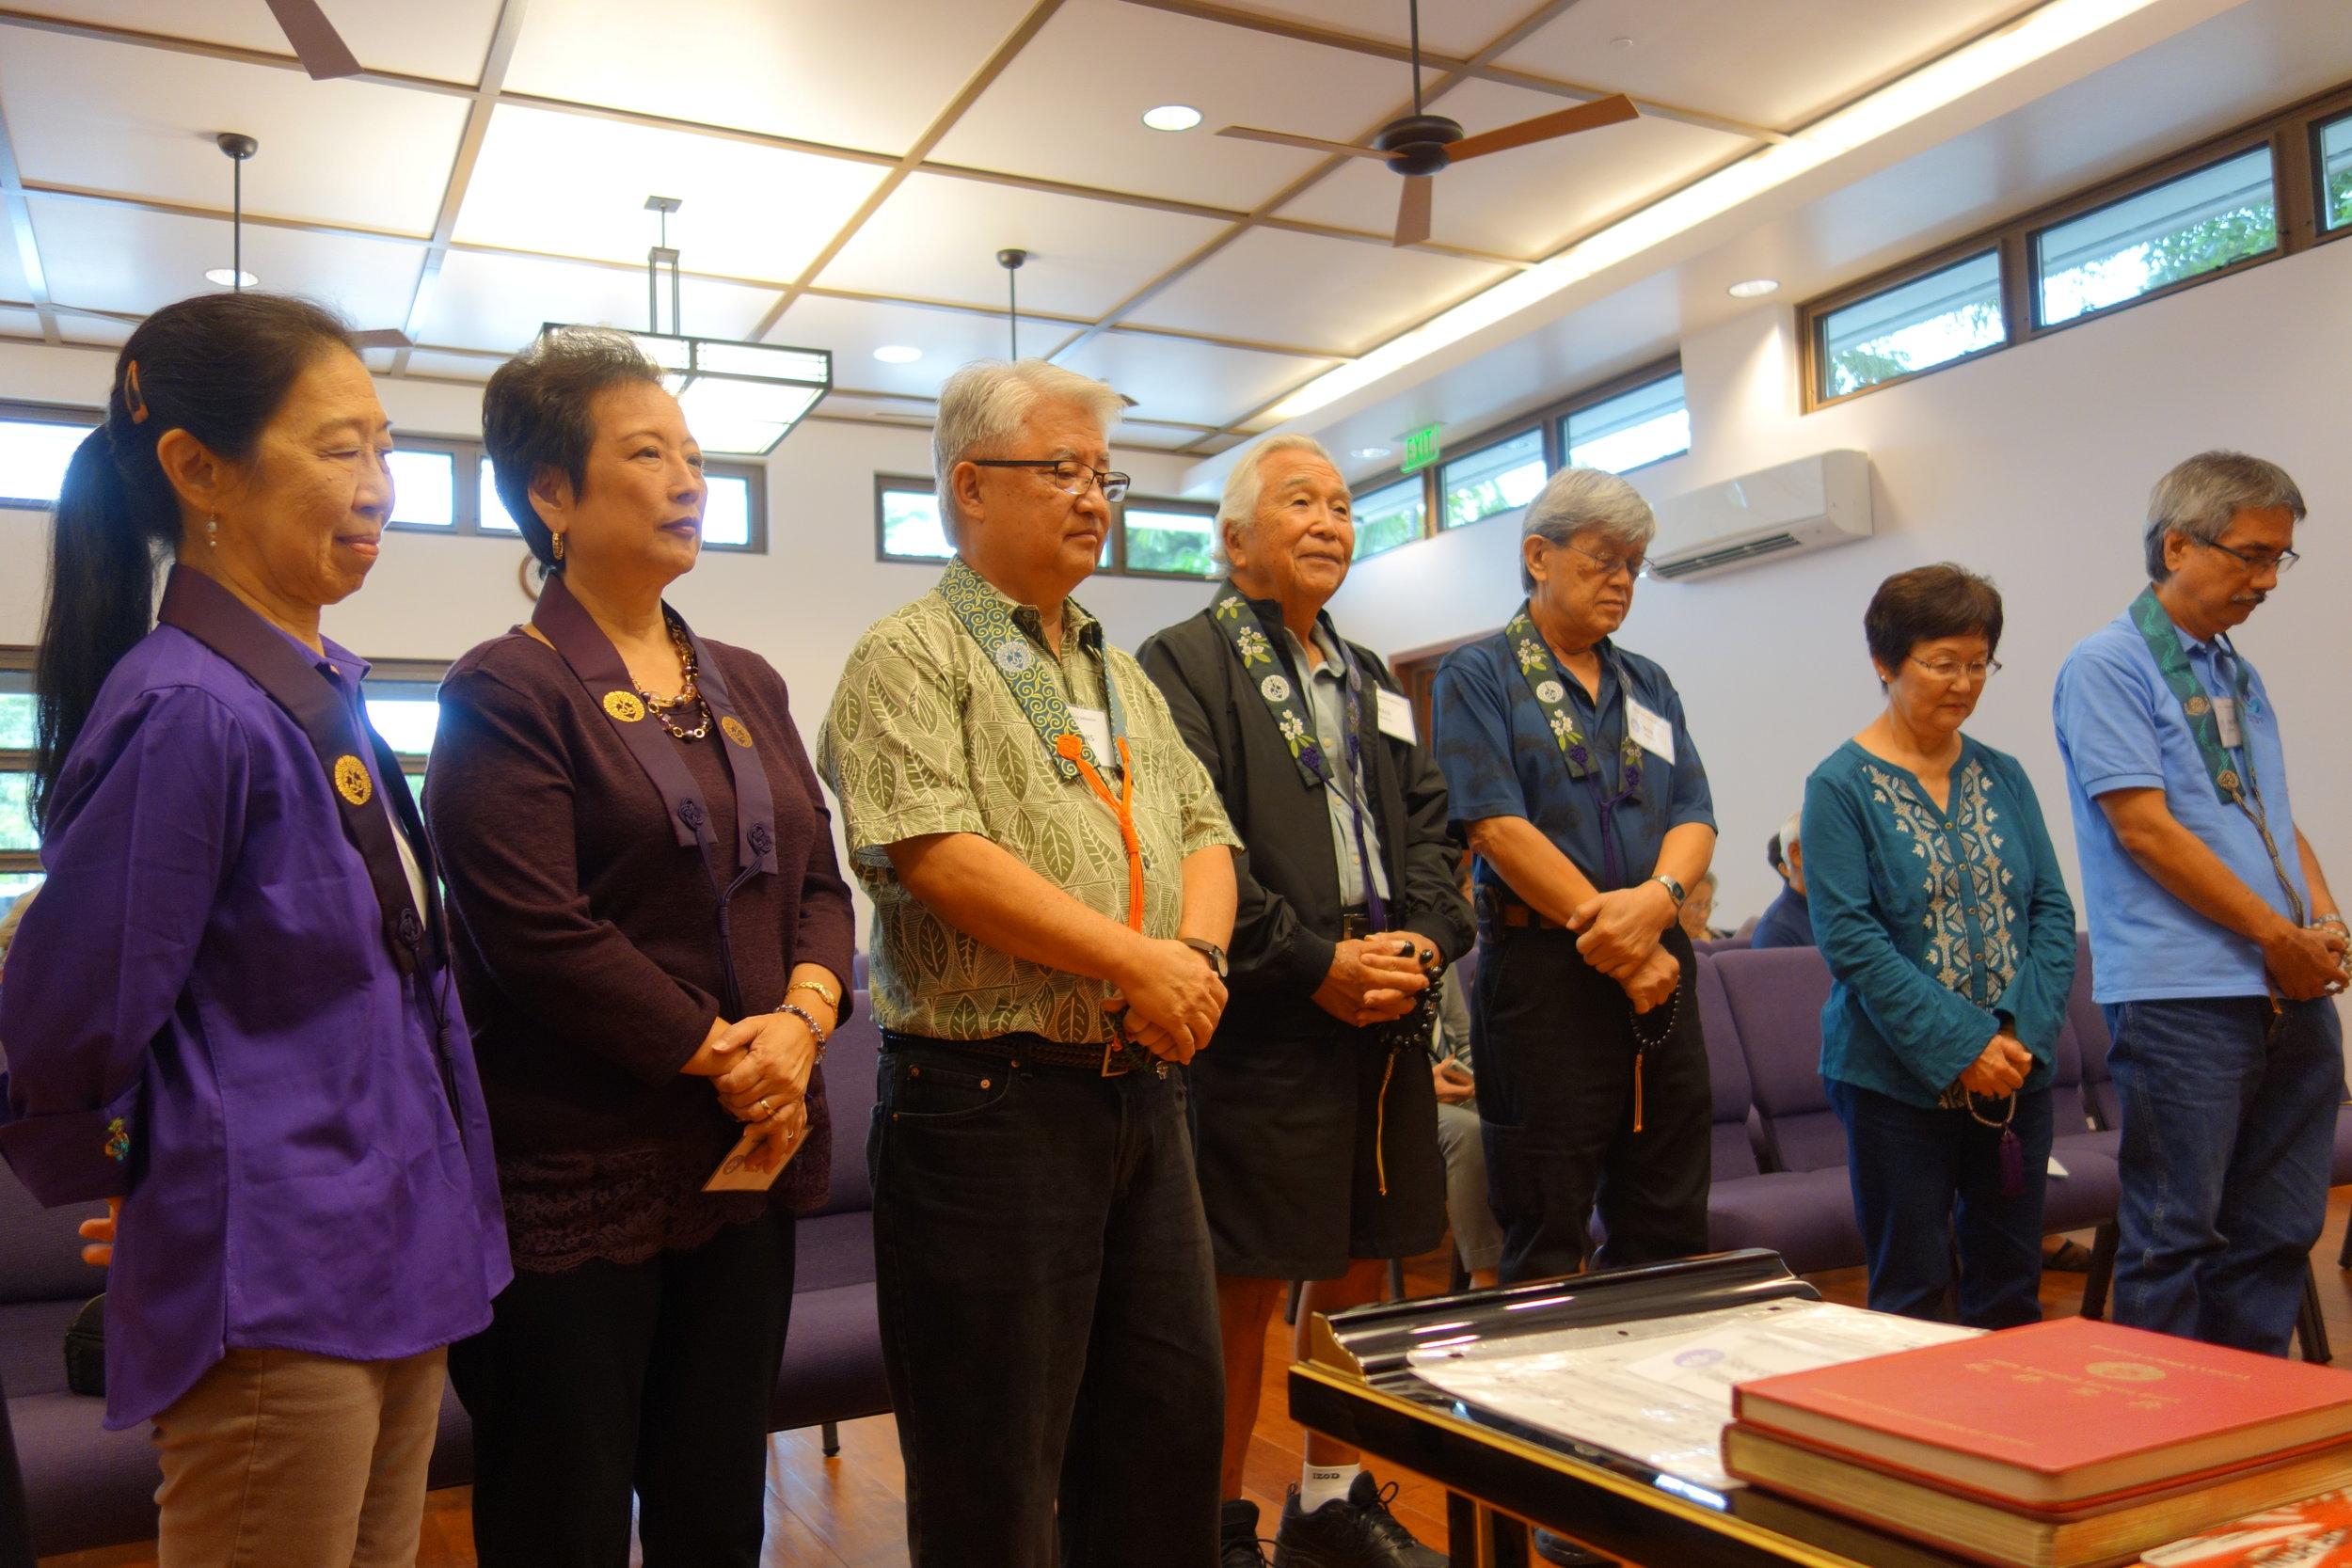 From left to right: Joyce Nishita, Merle Tashiro, Dennis Tashiro, Keiji Kukino, Bob Nishita, Geraldine Ochikubo, Gerald Matsuda.